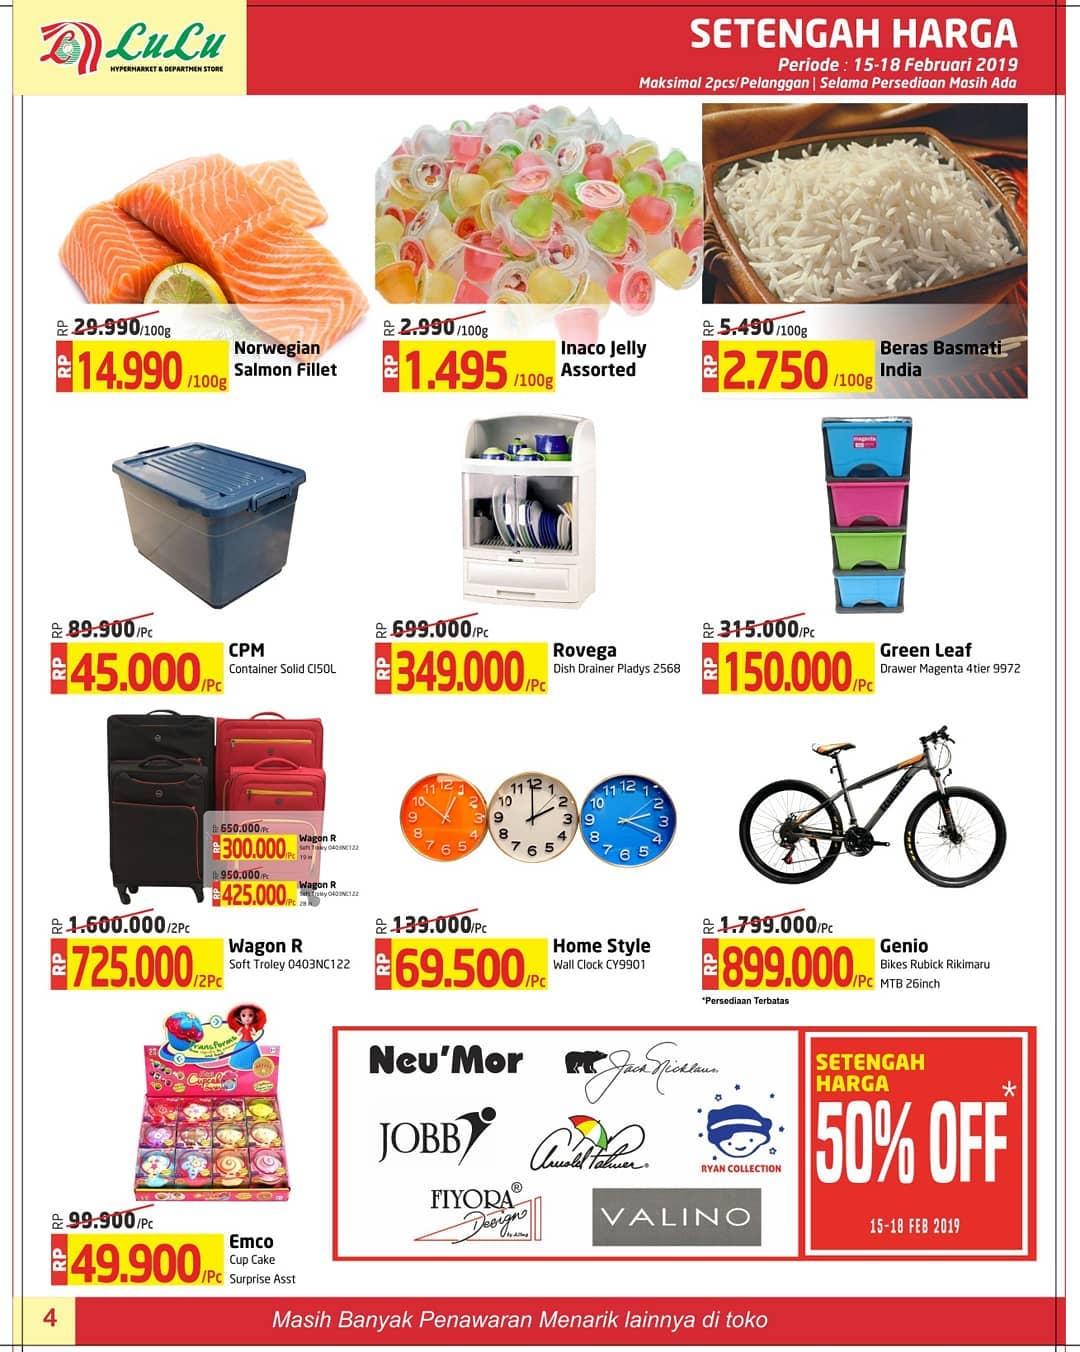 #LuluStore - #Promo #Katalog JSM Periode 15 - 18 Februari 2019